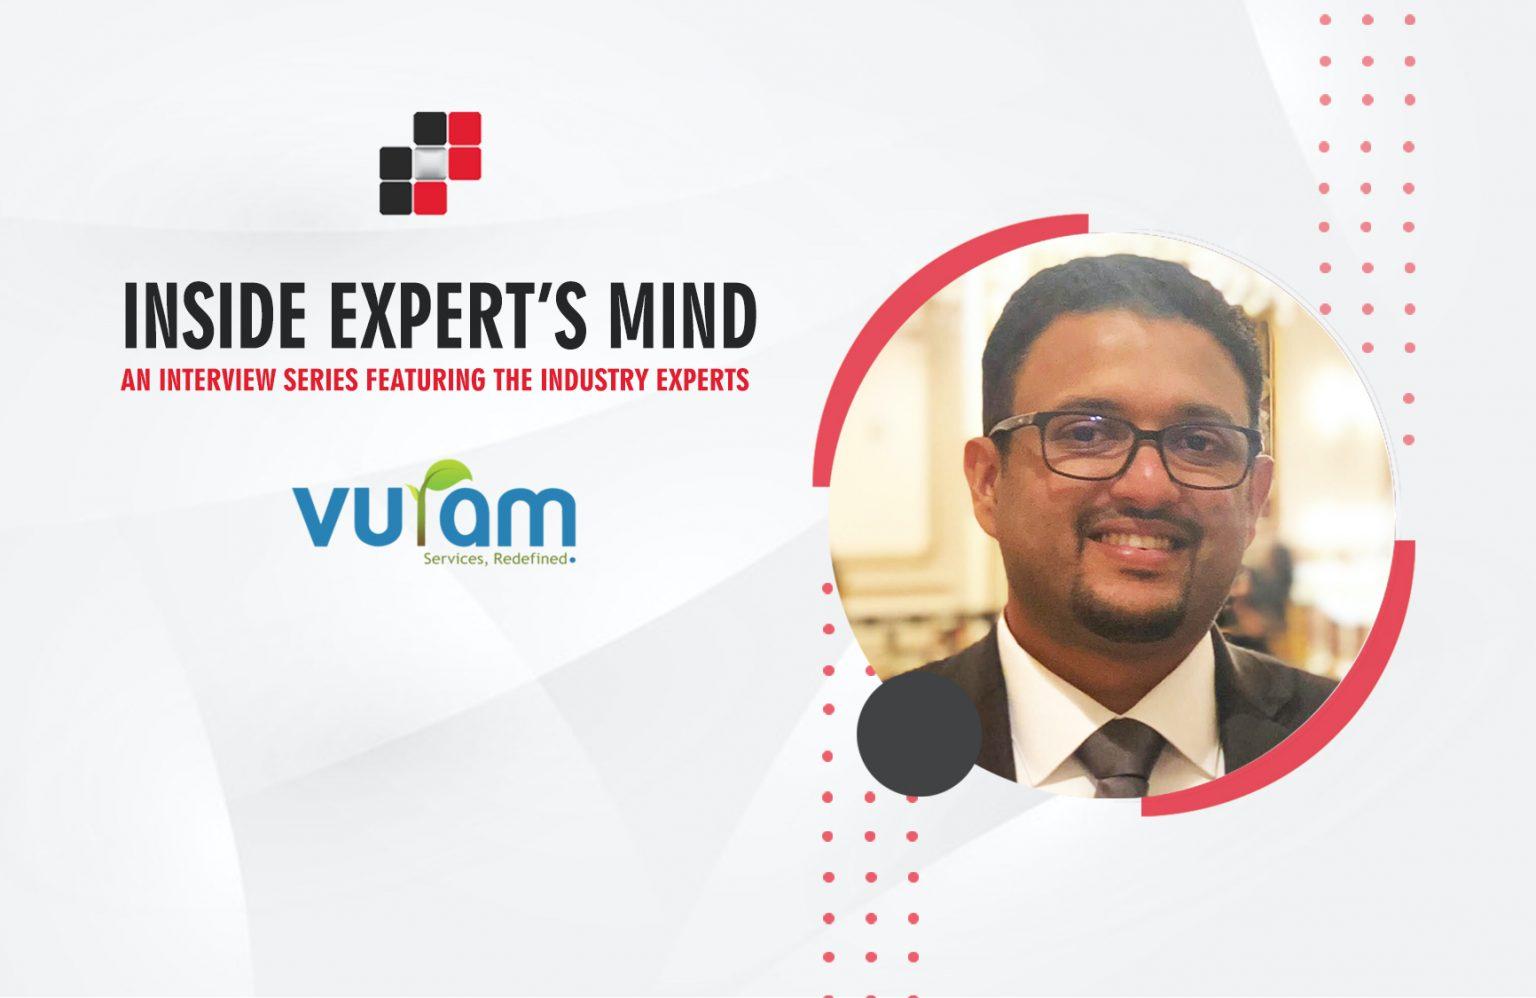 Arjun Devadas, Sr. VP, Professional Services & Operations (Americas) at Vuram